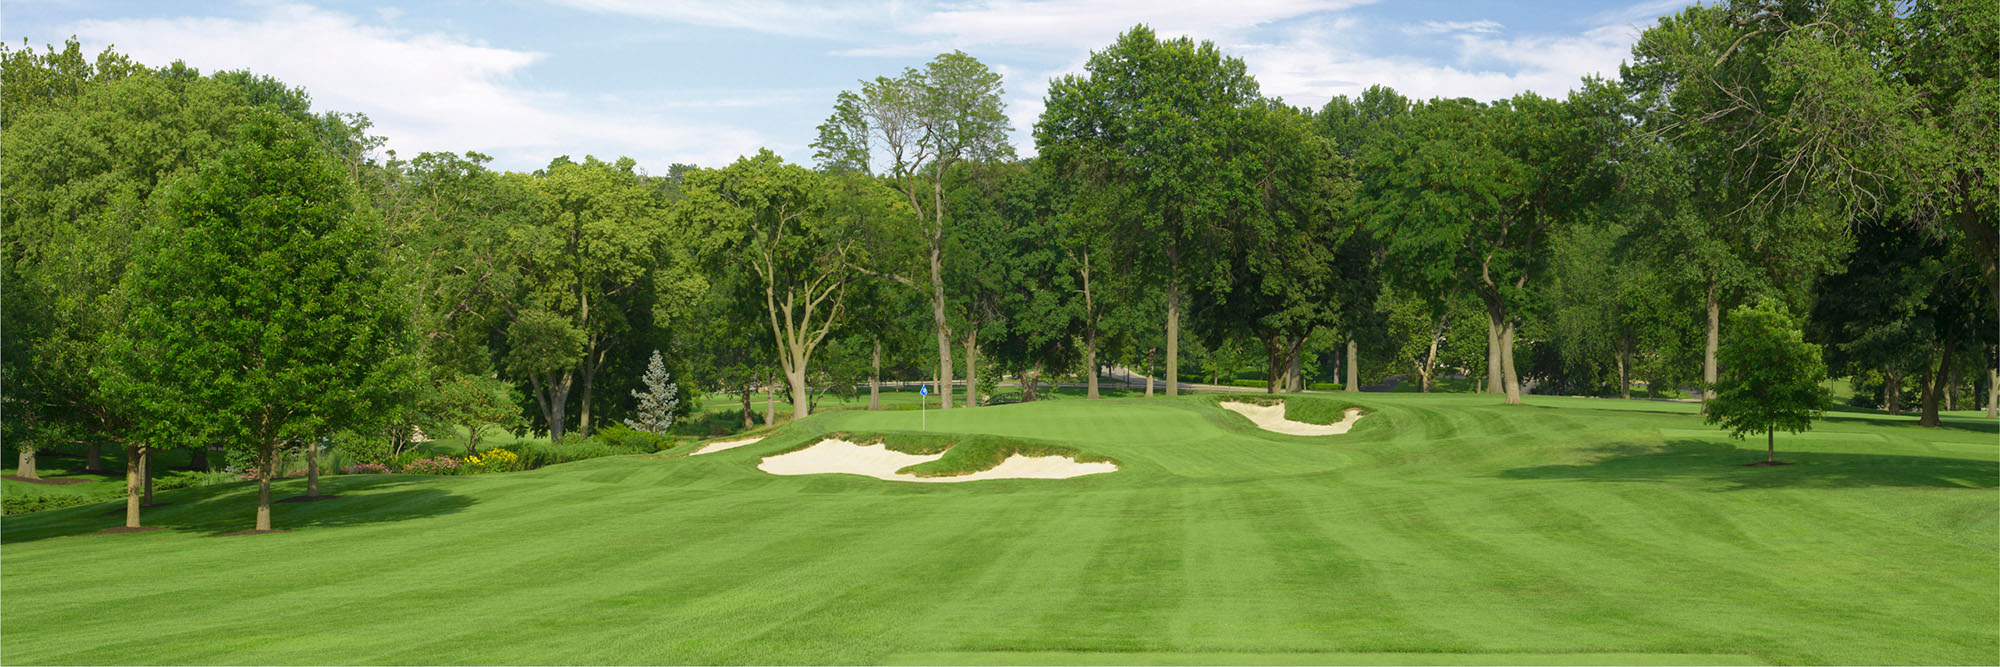 Golf Course Image - Mission Hills No. 3